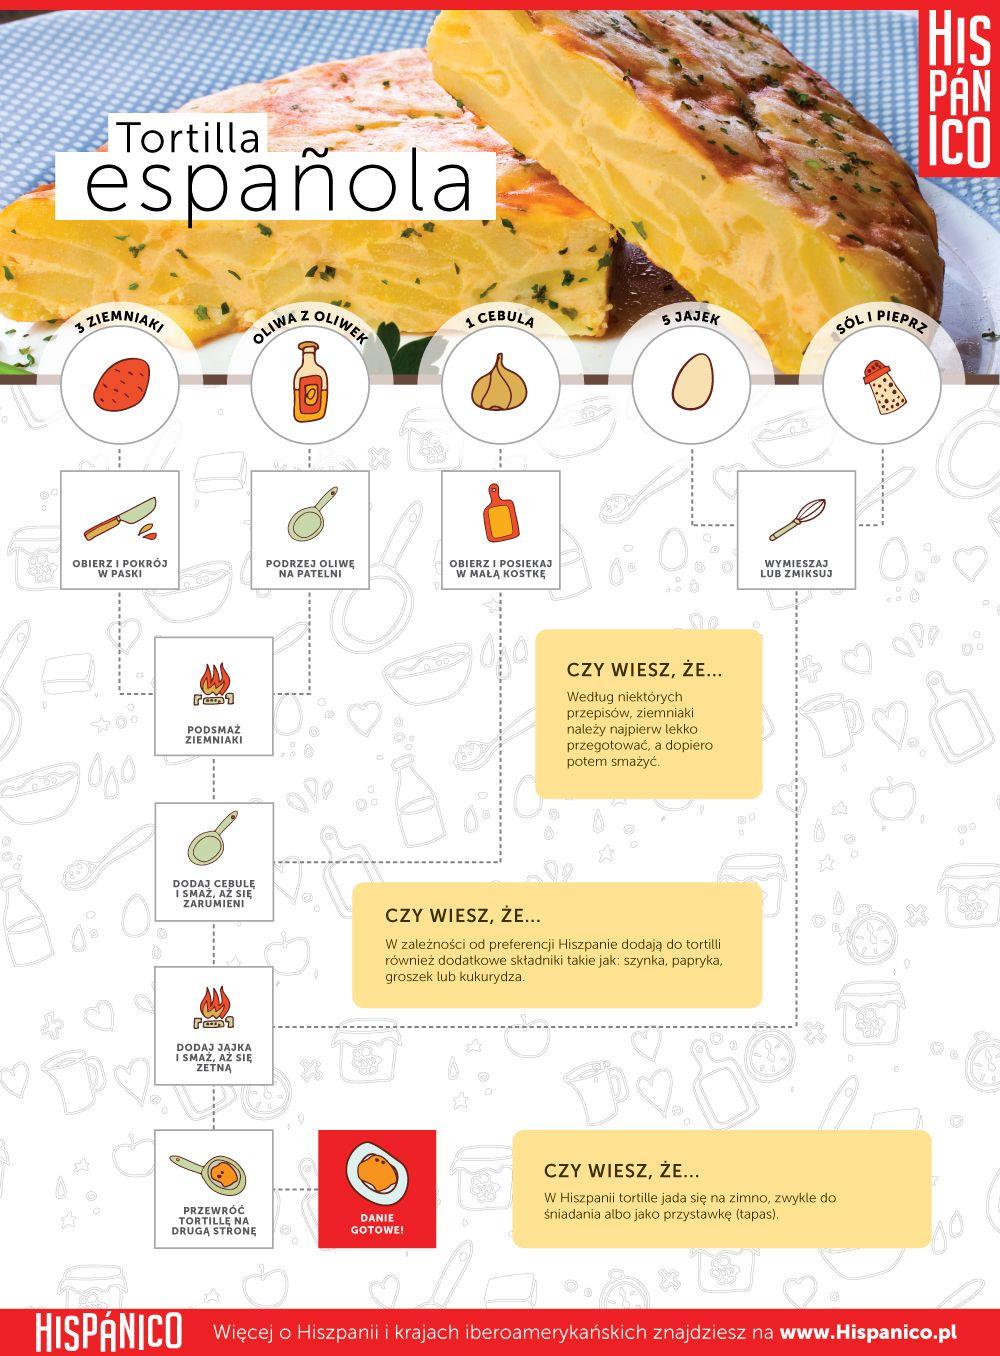 Przepis Na Hiszpanska Tortille W Formie Infografiki Hispanico Pl Hiszpania Hiszpanski Tortilla Espanola Tortillaespanola Infografika Map